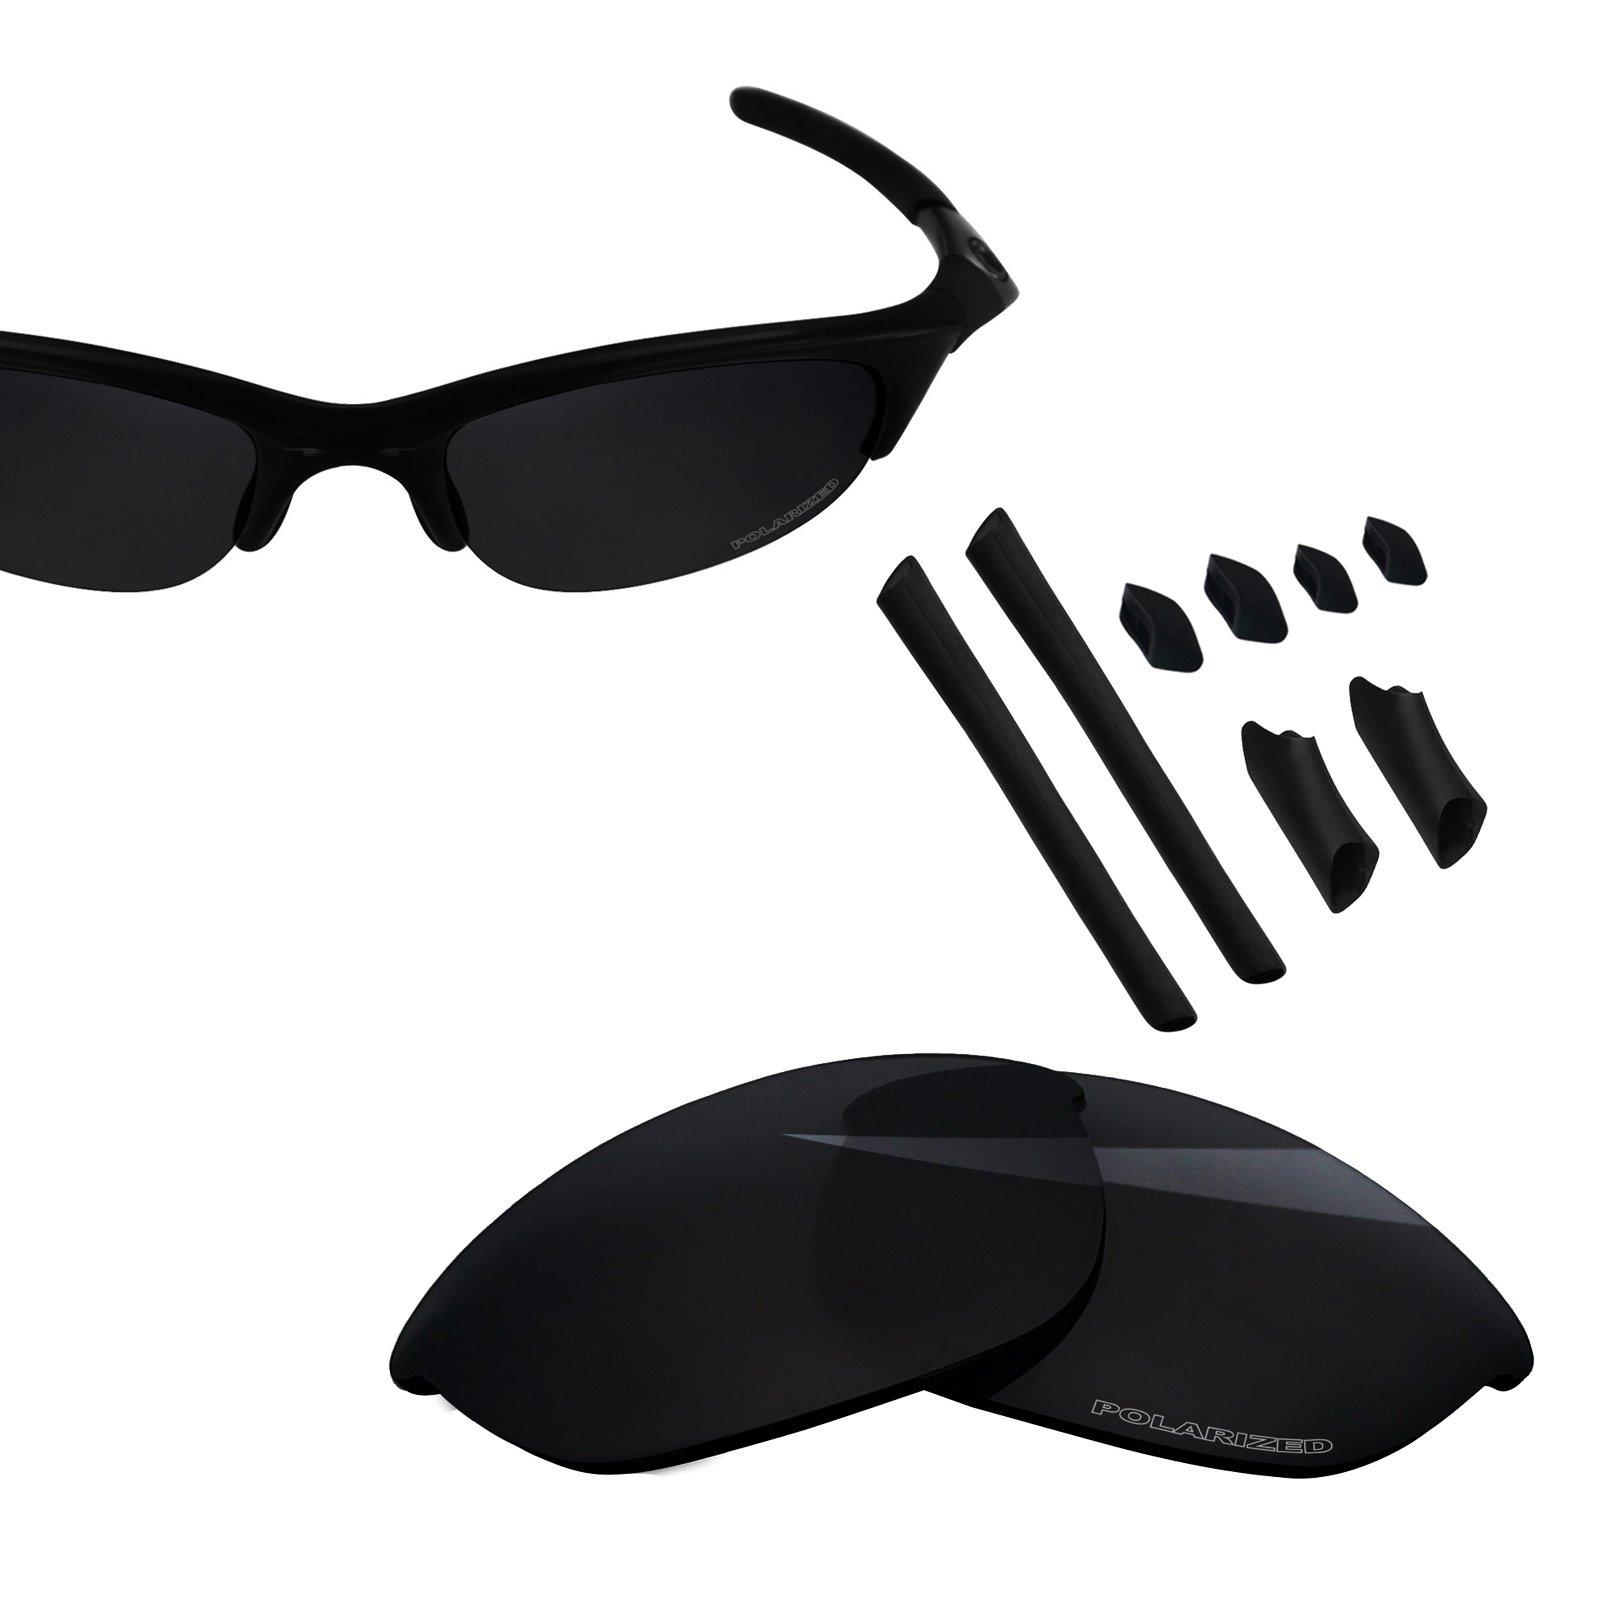 BlazerBuck Anti-salt Polarized Replacement Lenses & Sock Kit for Oakley Half Jacket - Black